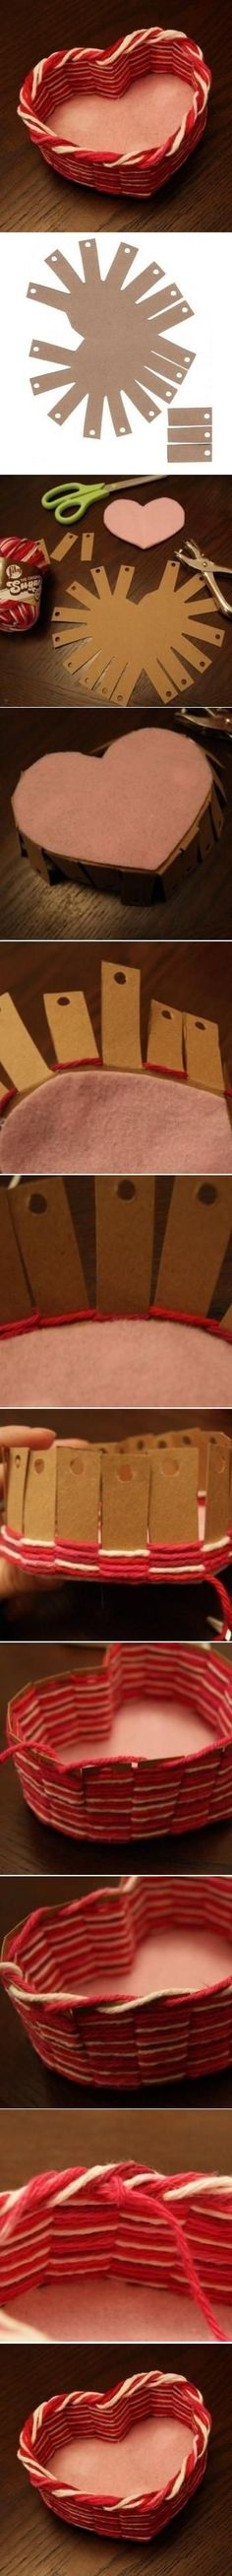 DIY Yarn Heart Box DIY Projects / UsefulDIY.com